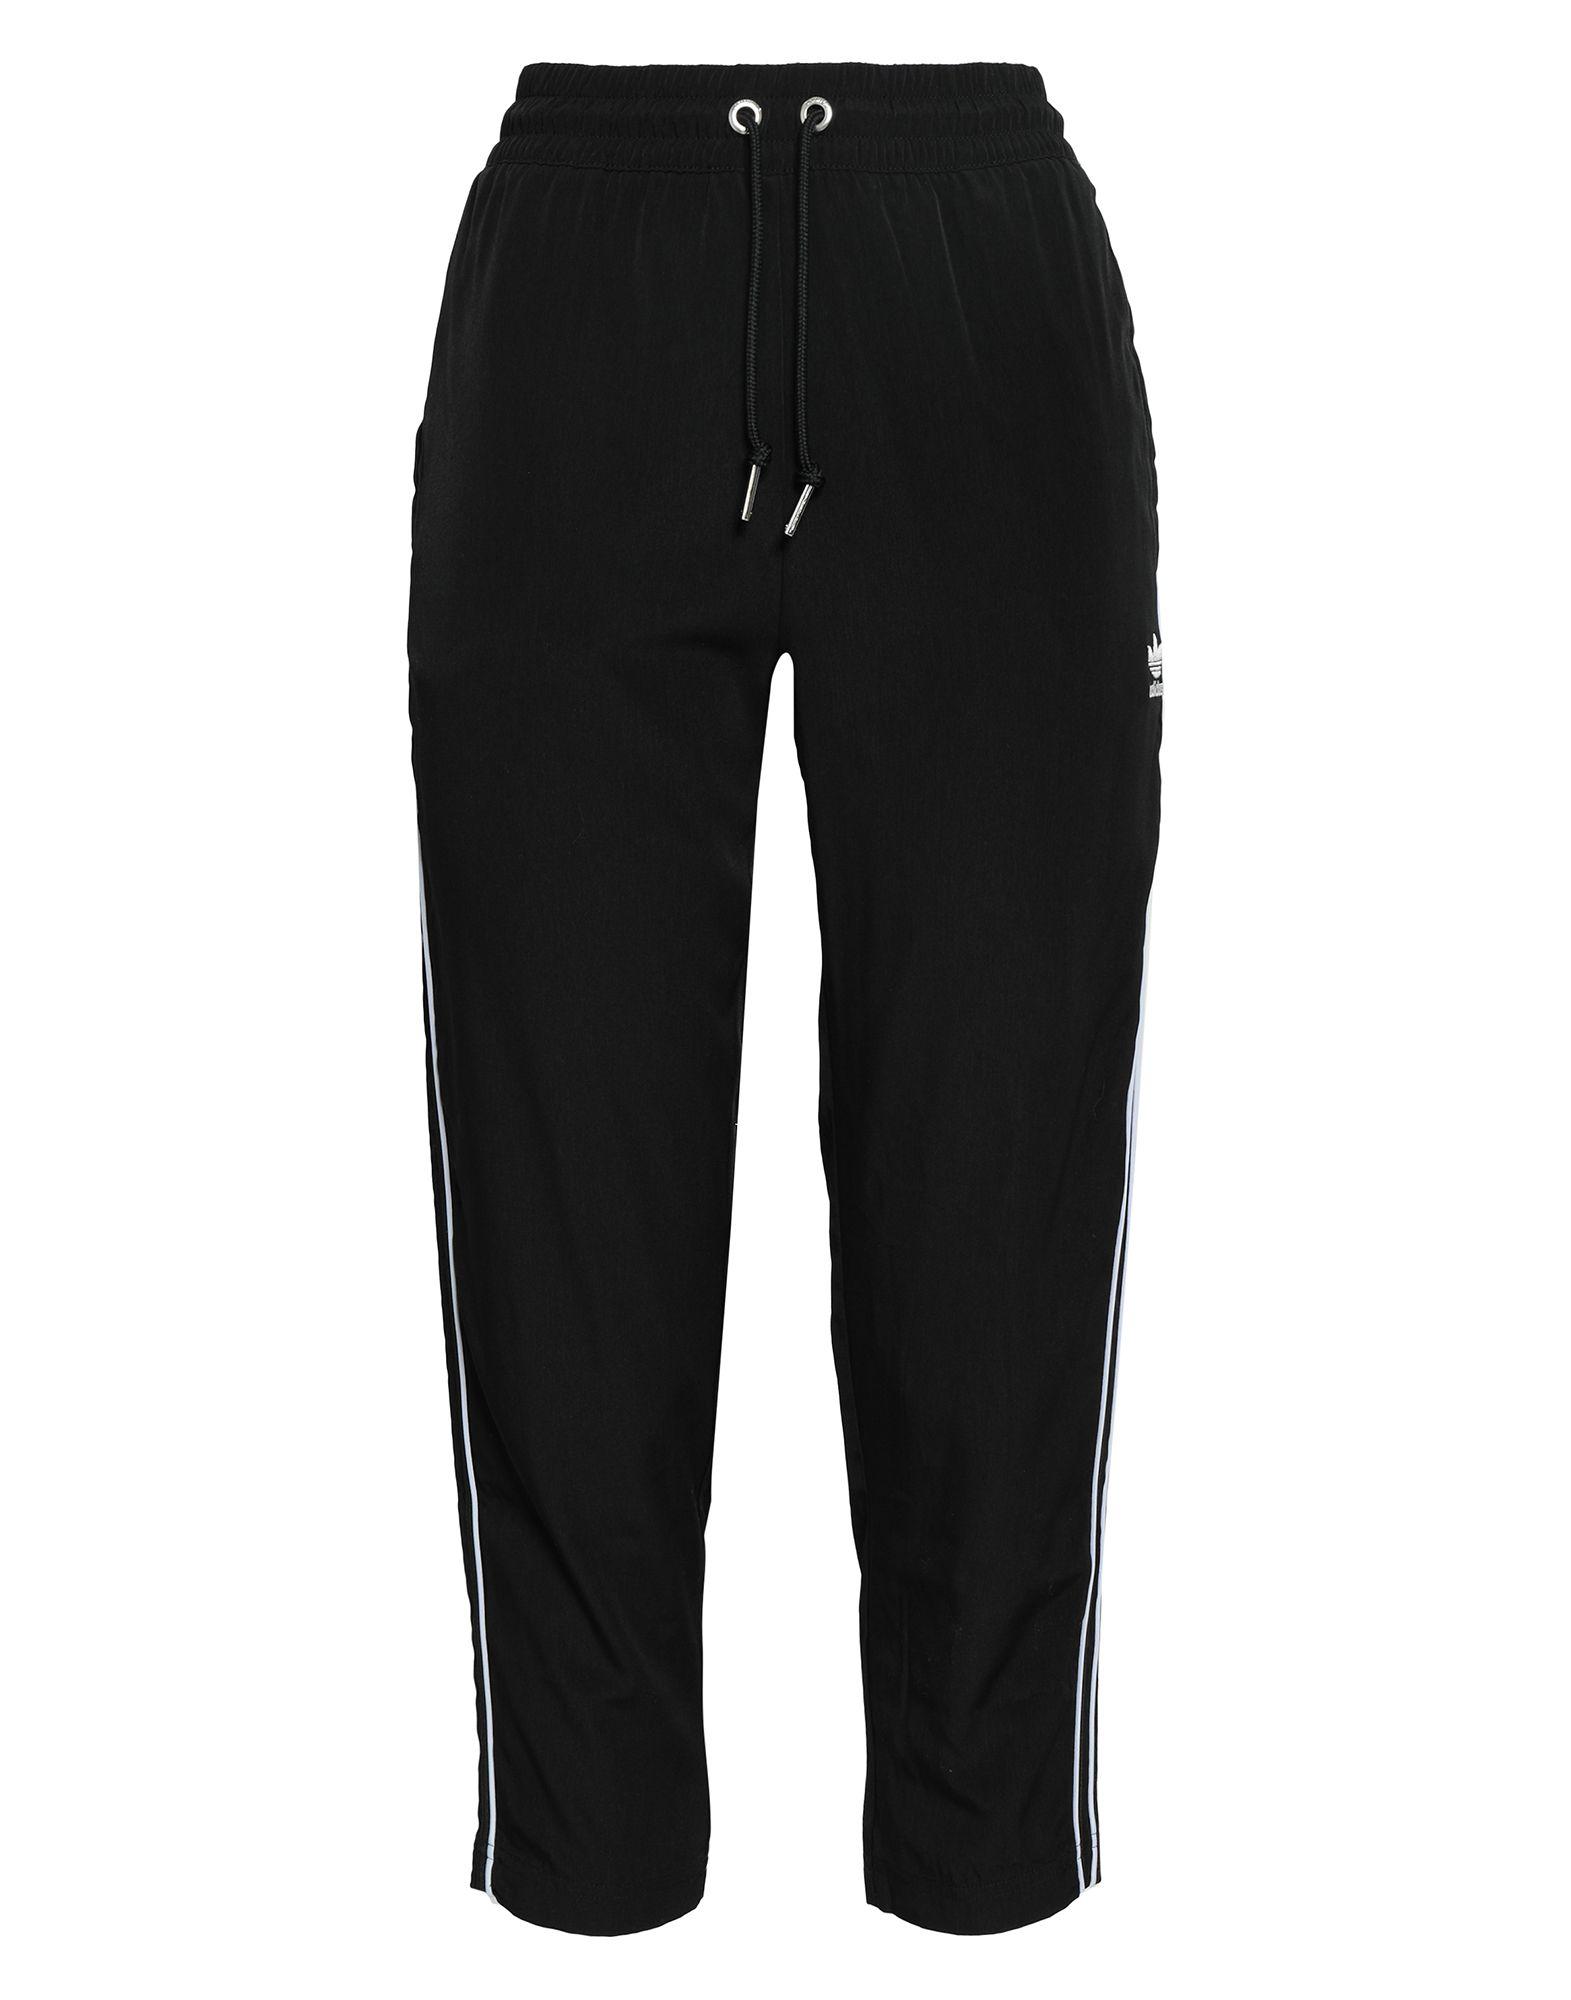 ADIDAS ORIGINALS Брюки-капри adidas брюки капри